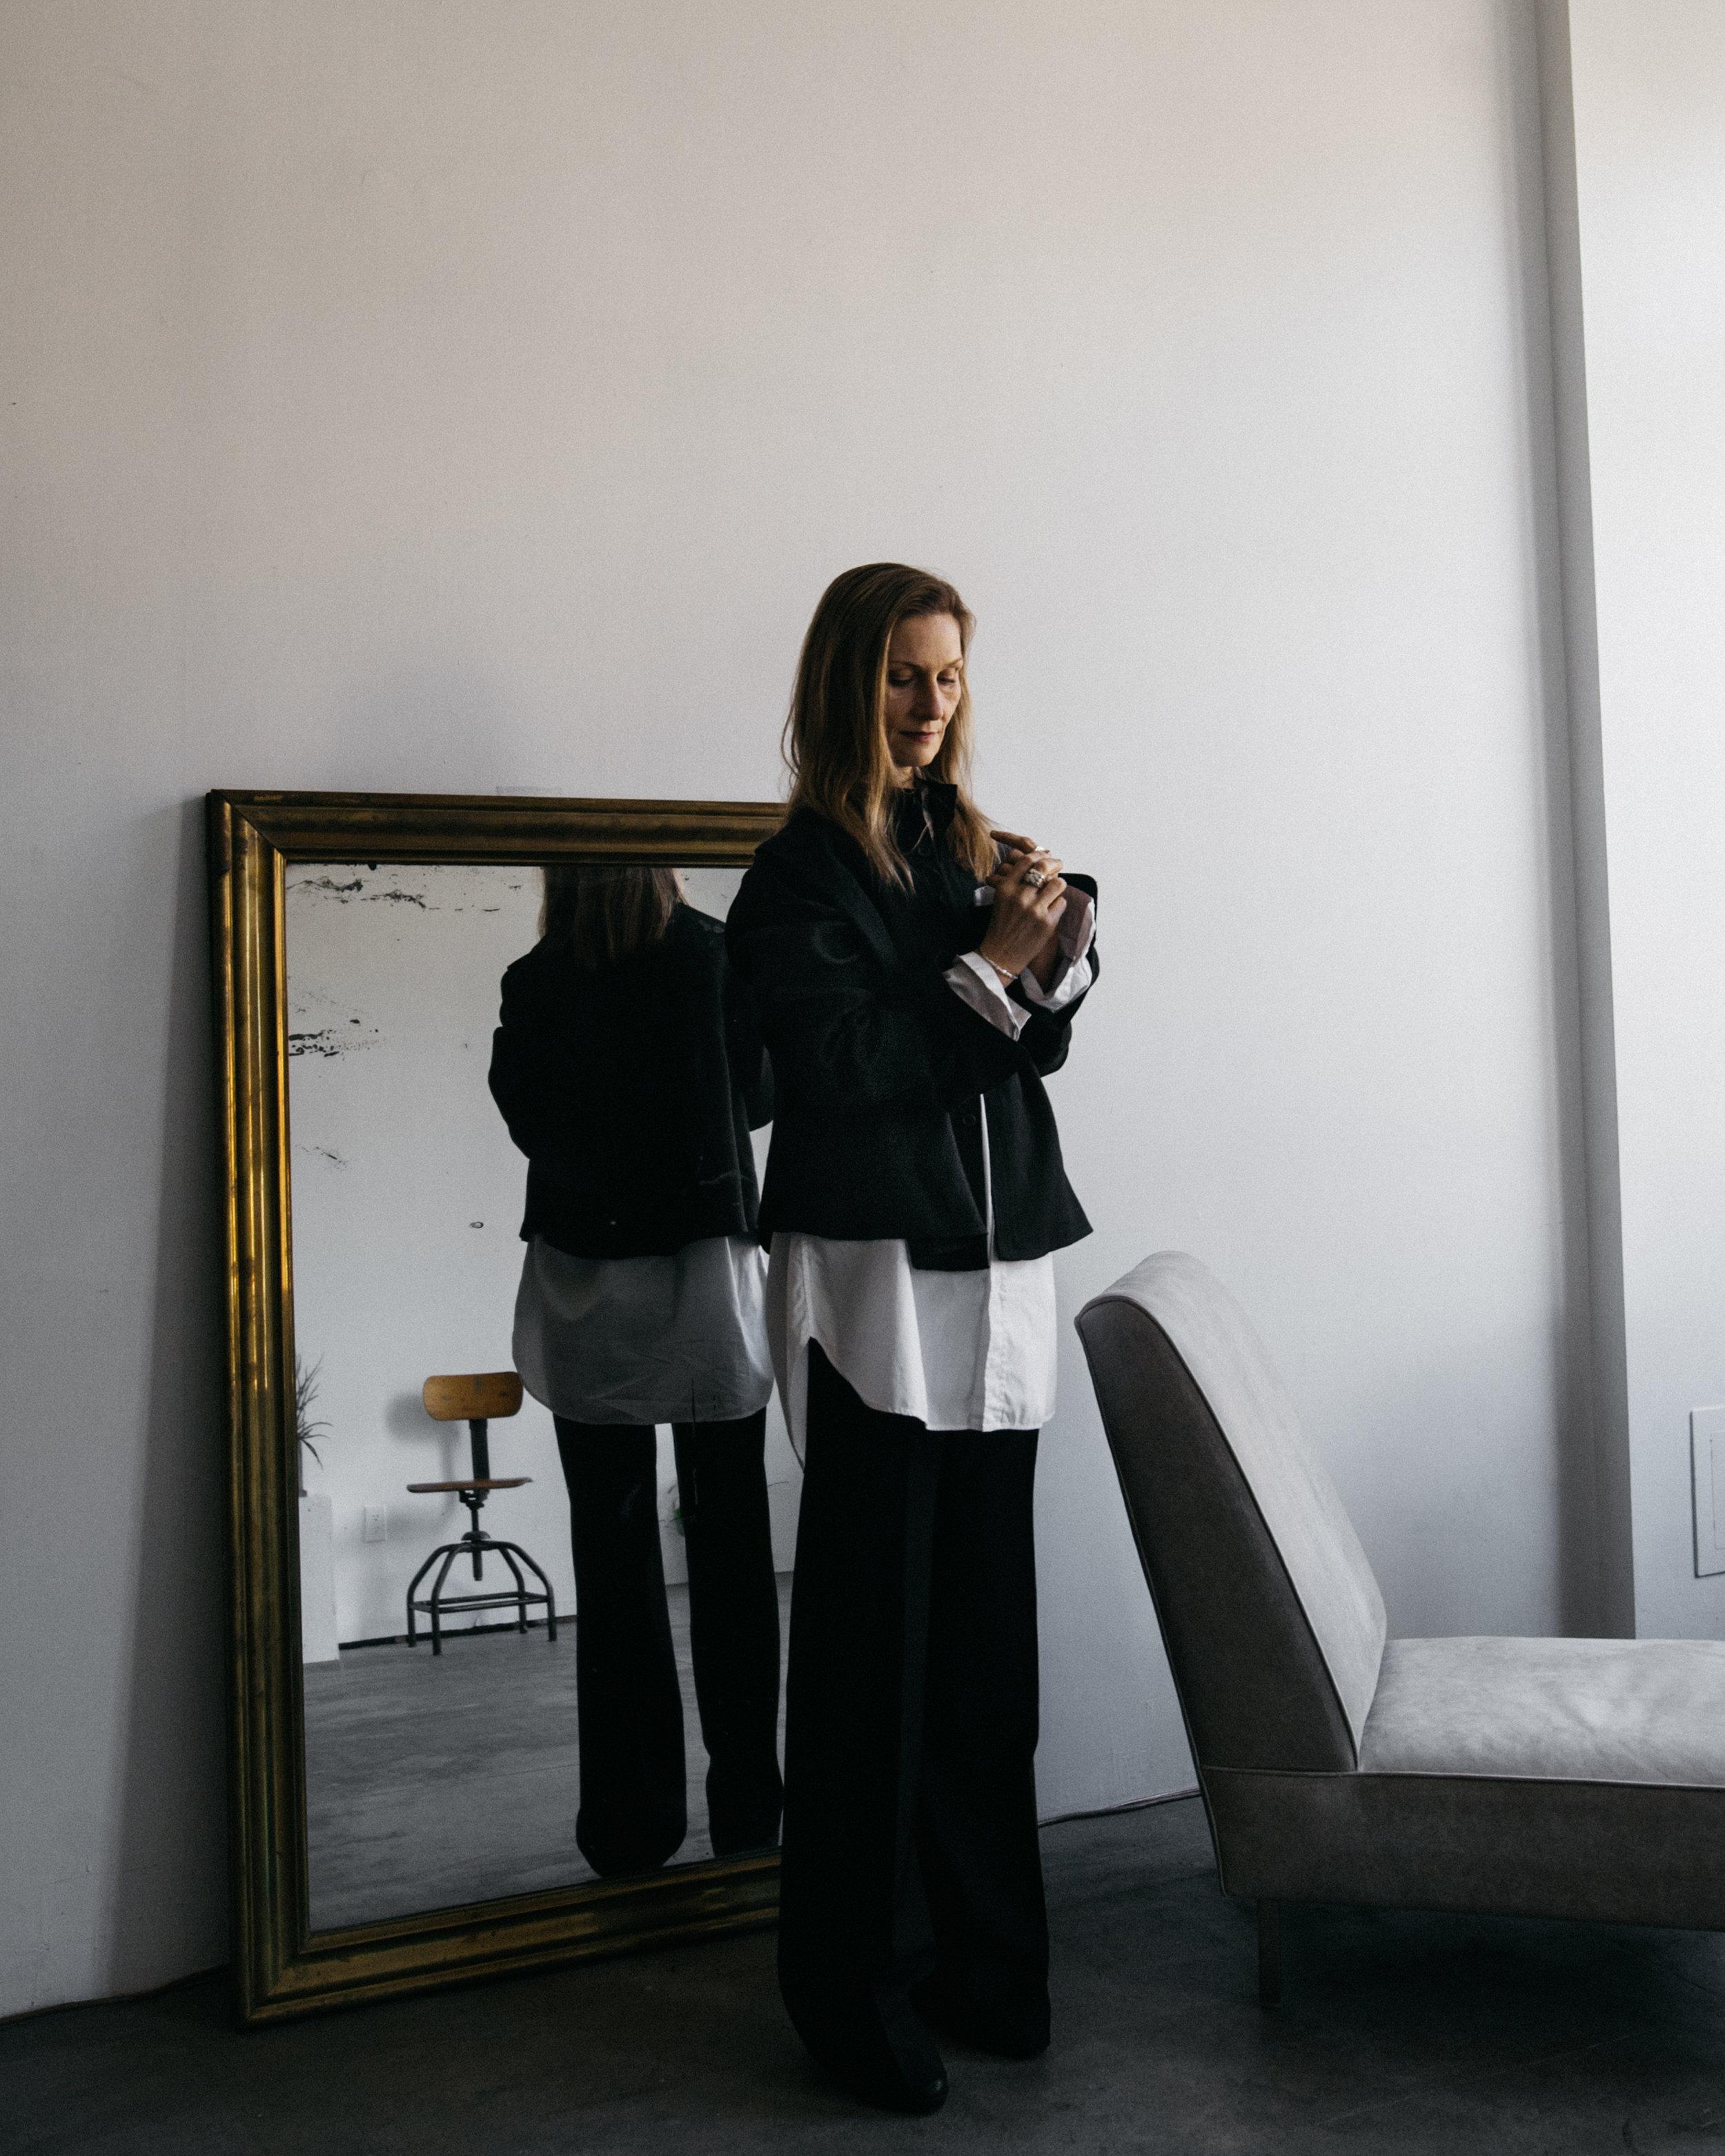 Black shirt - Dsecond  White shirt - Yohji Yamamoto  Pants - Filippa K  Shoes -Maison Martin Margiela  Jewelries - Kei Shigenaga